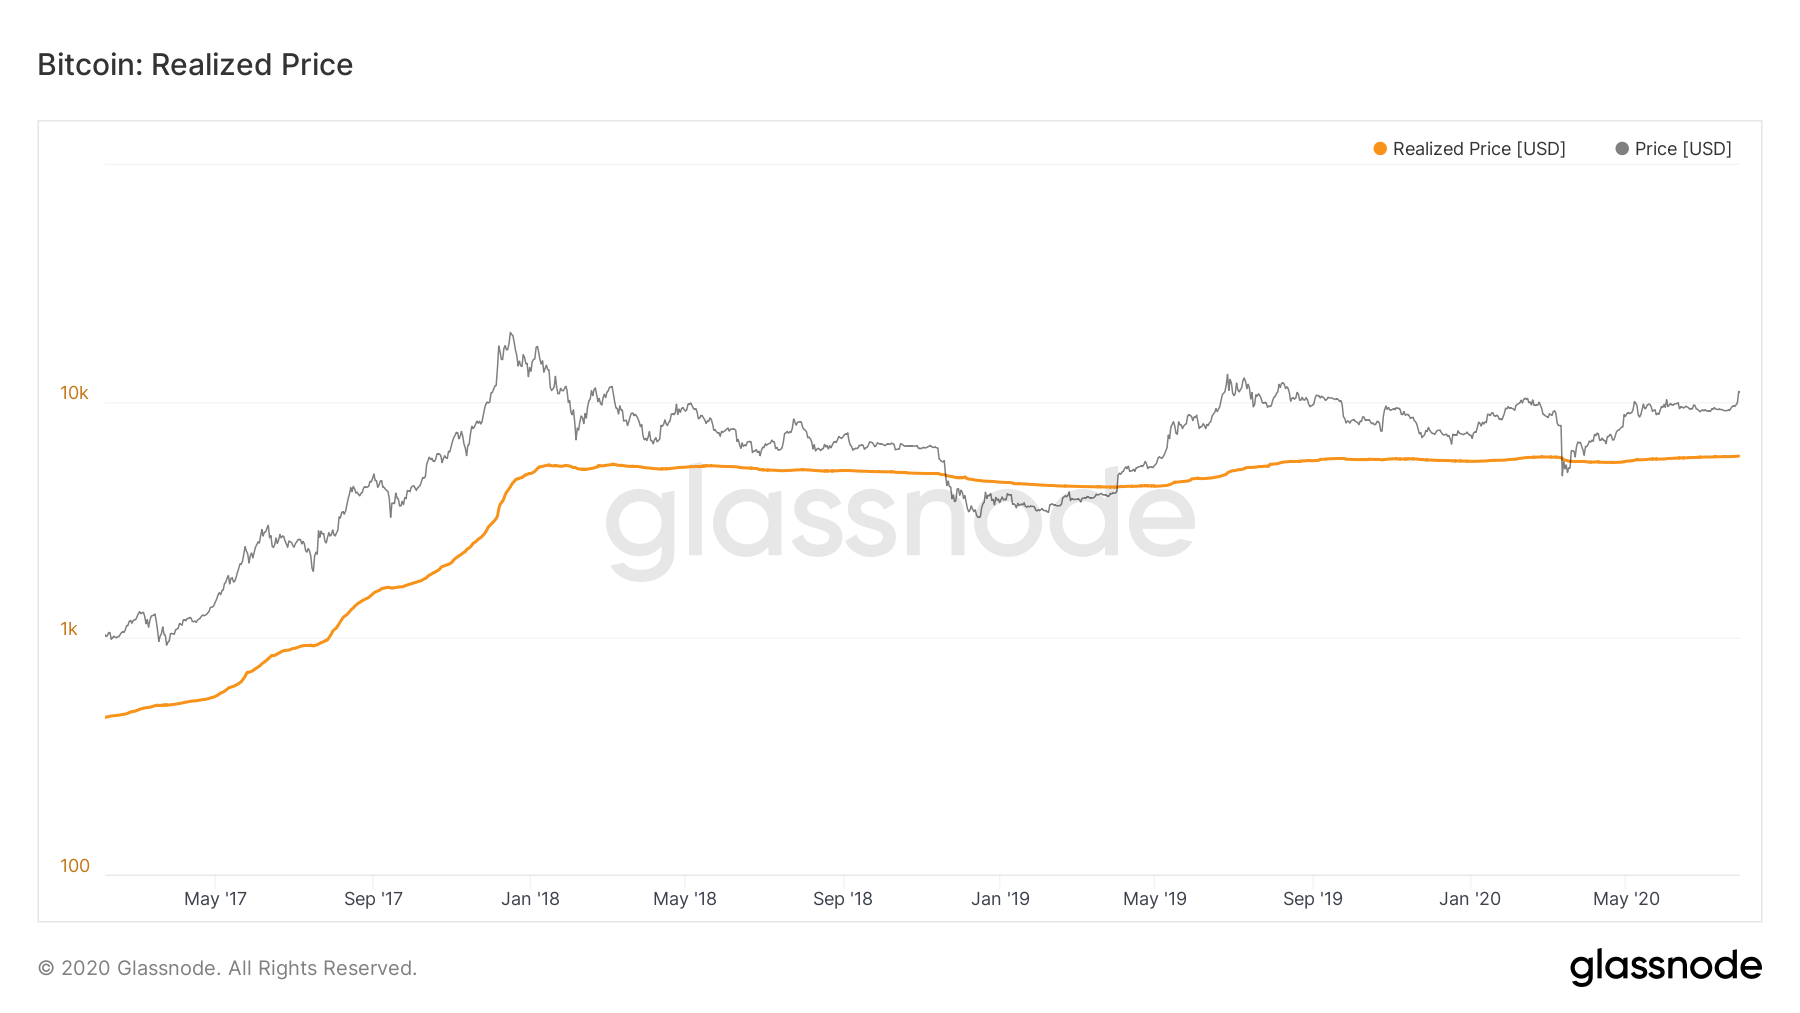 Bitcoin price versus realized price. Source: Glassnode.